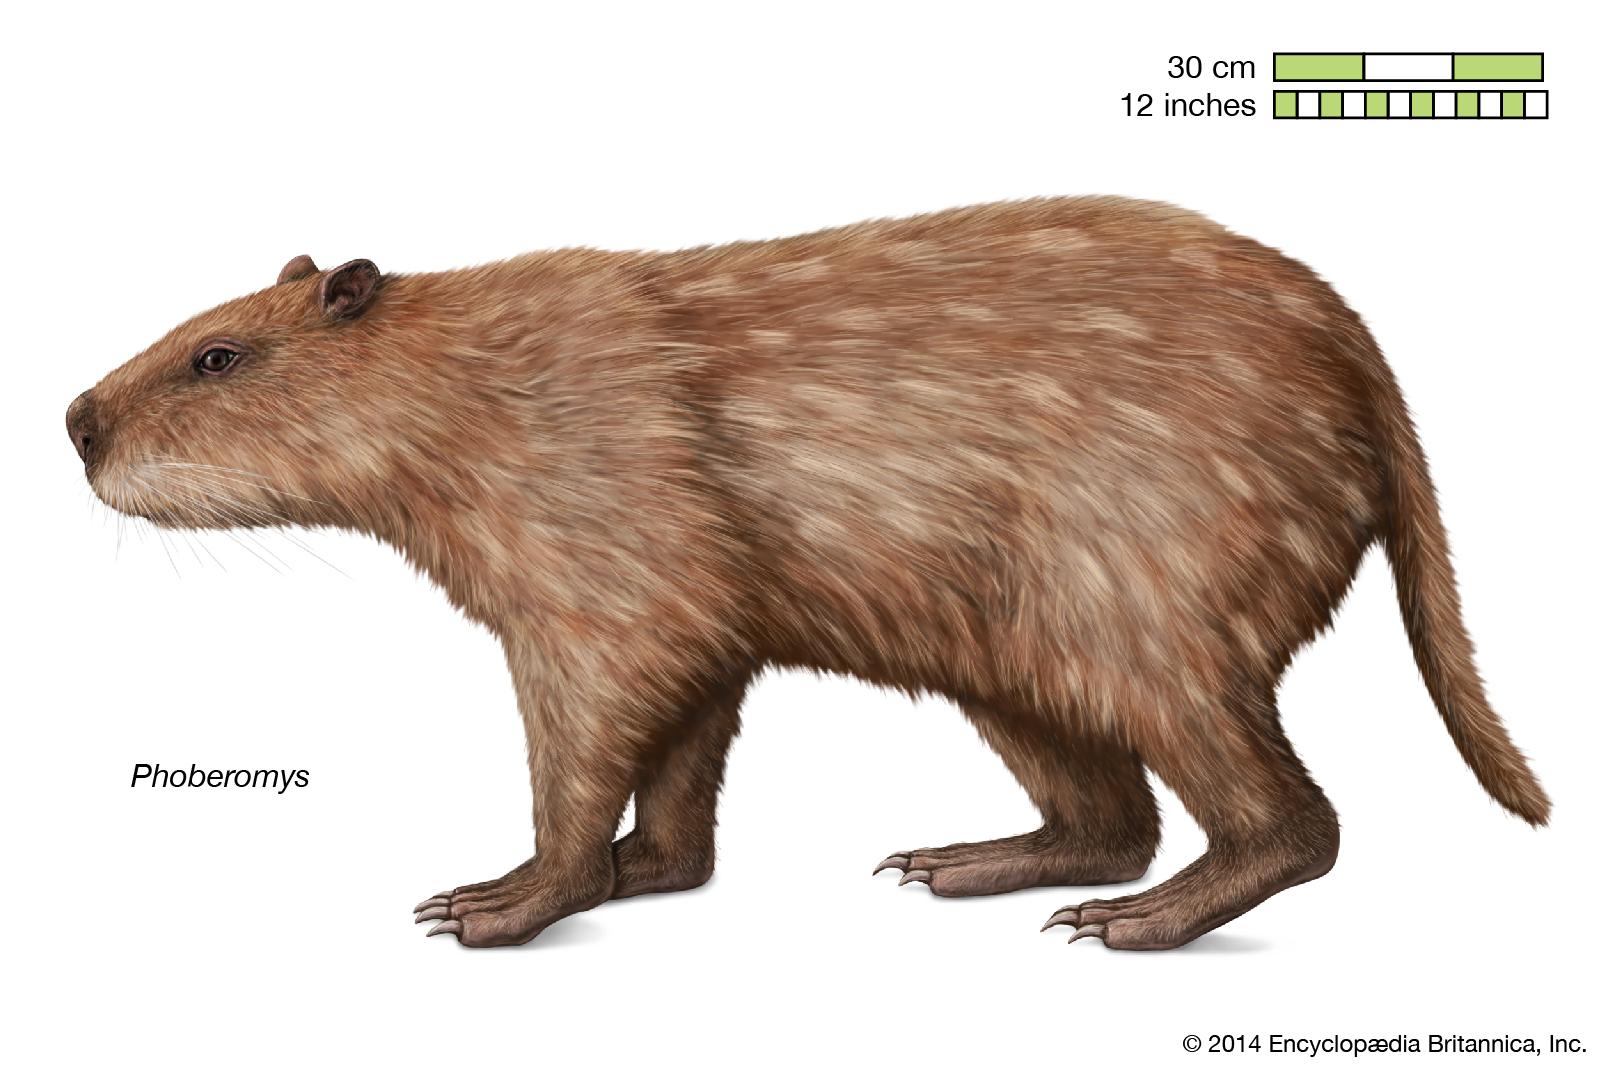 Phoberomys-Rodentia-member